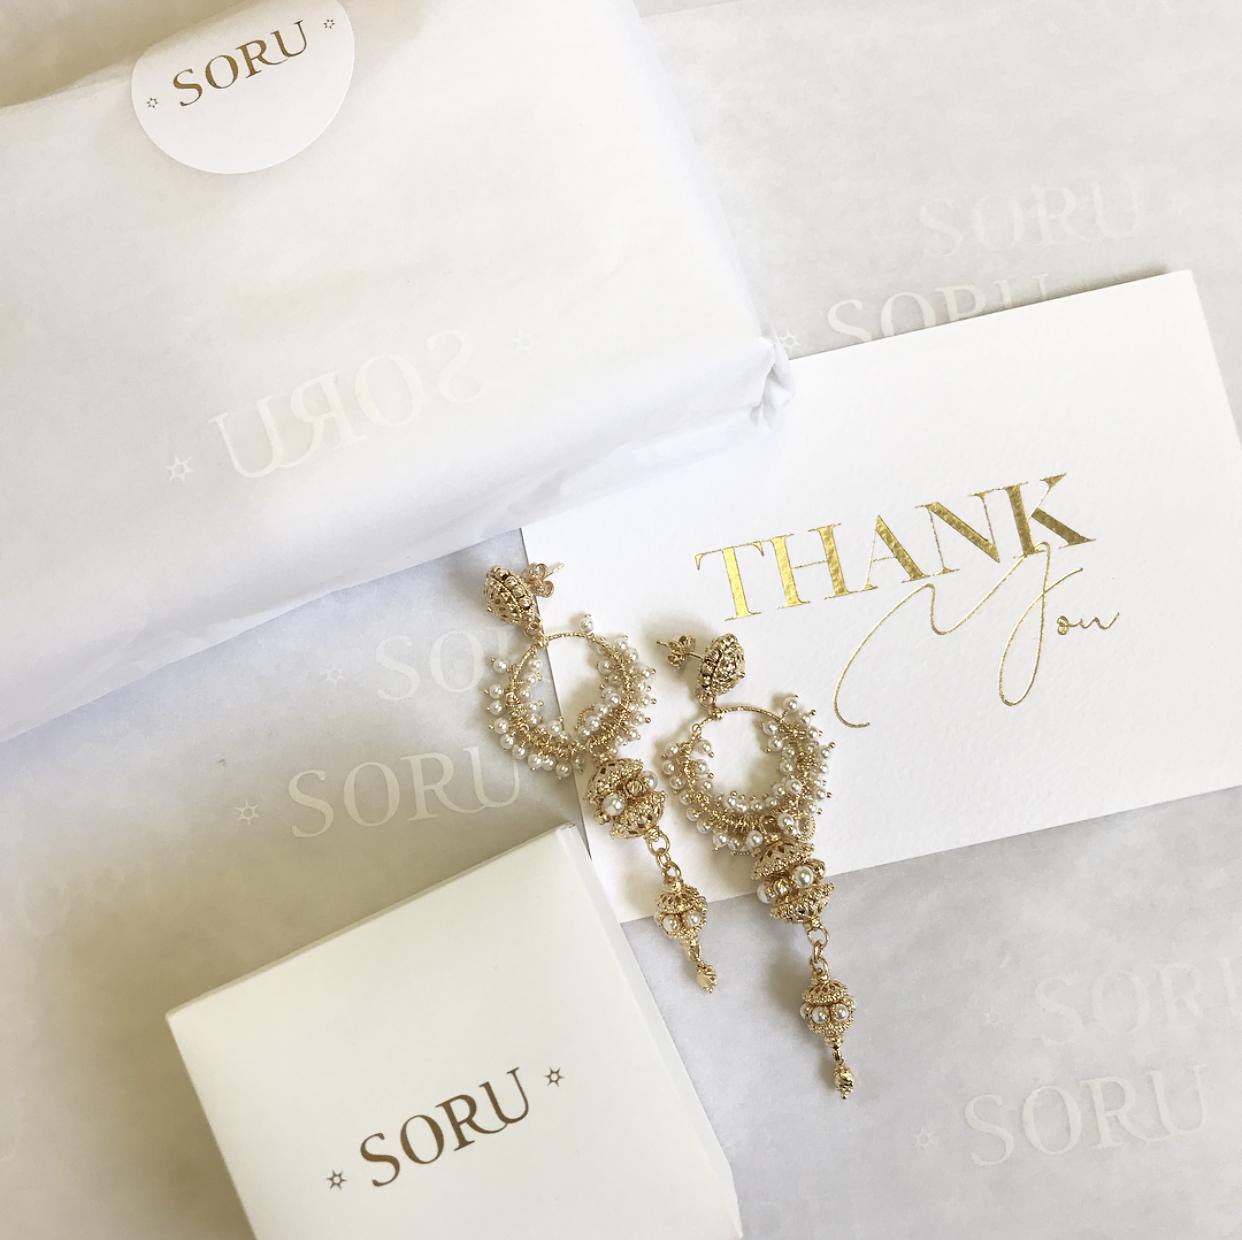 Soru Jewellery flatlay with custom tissue paper